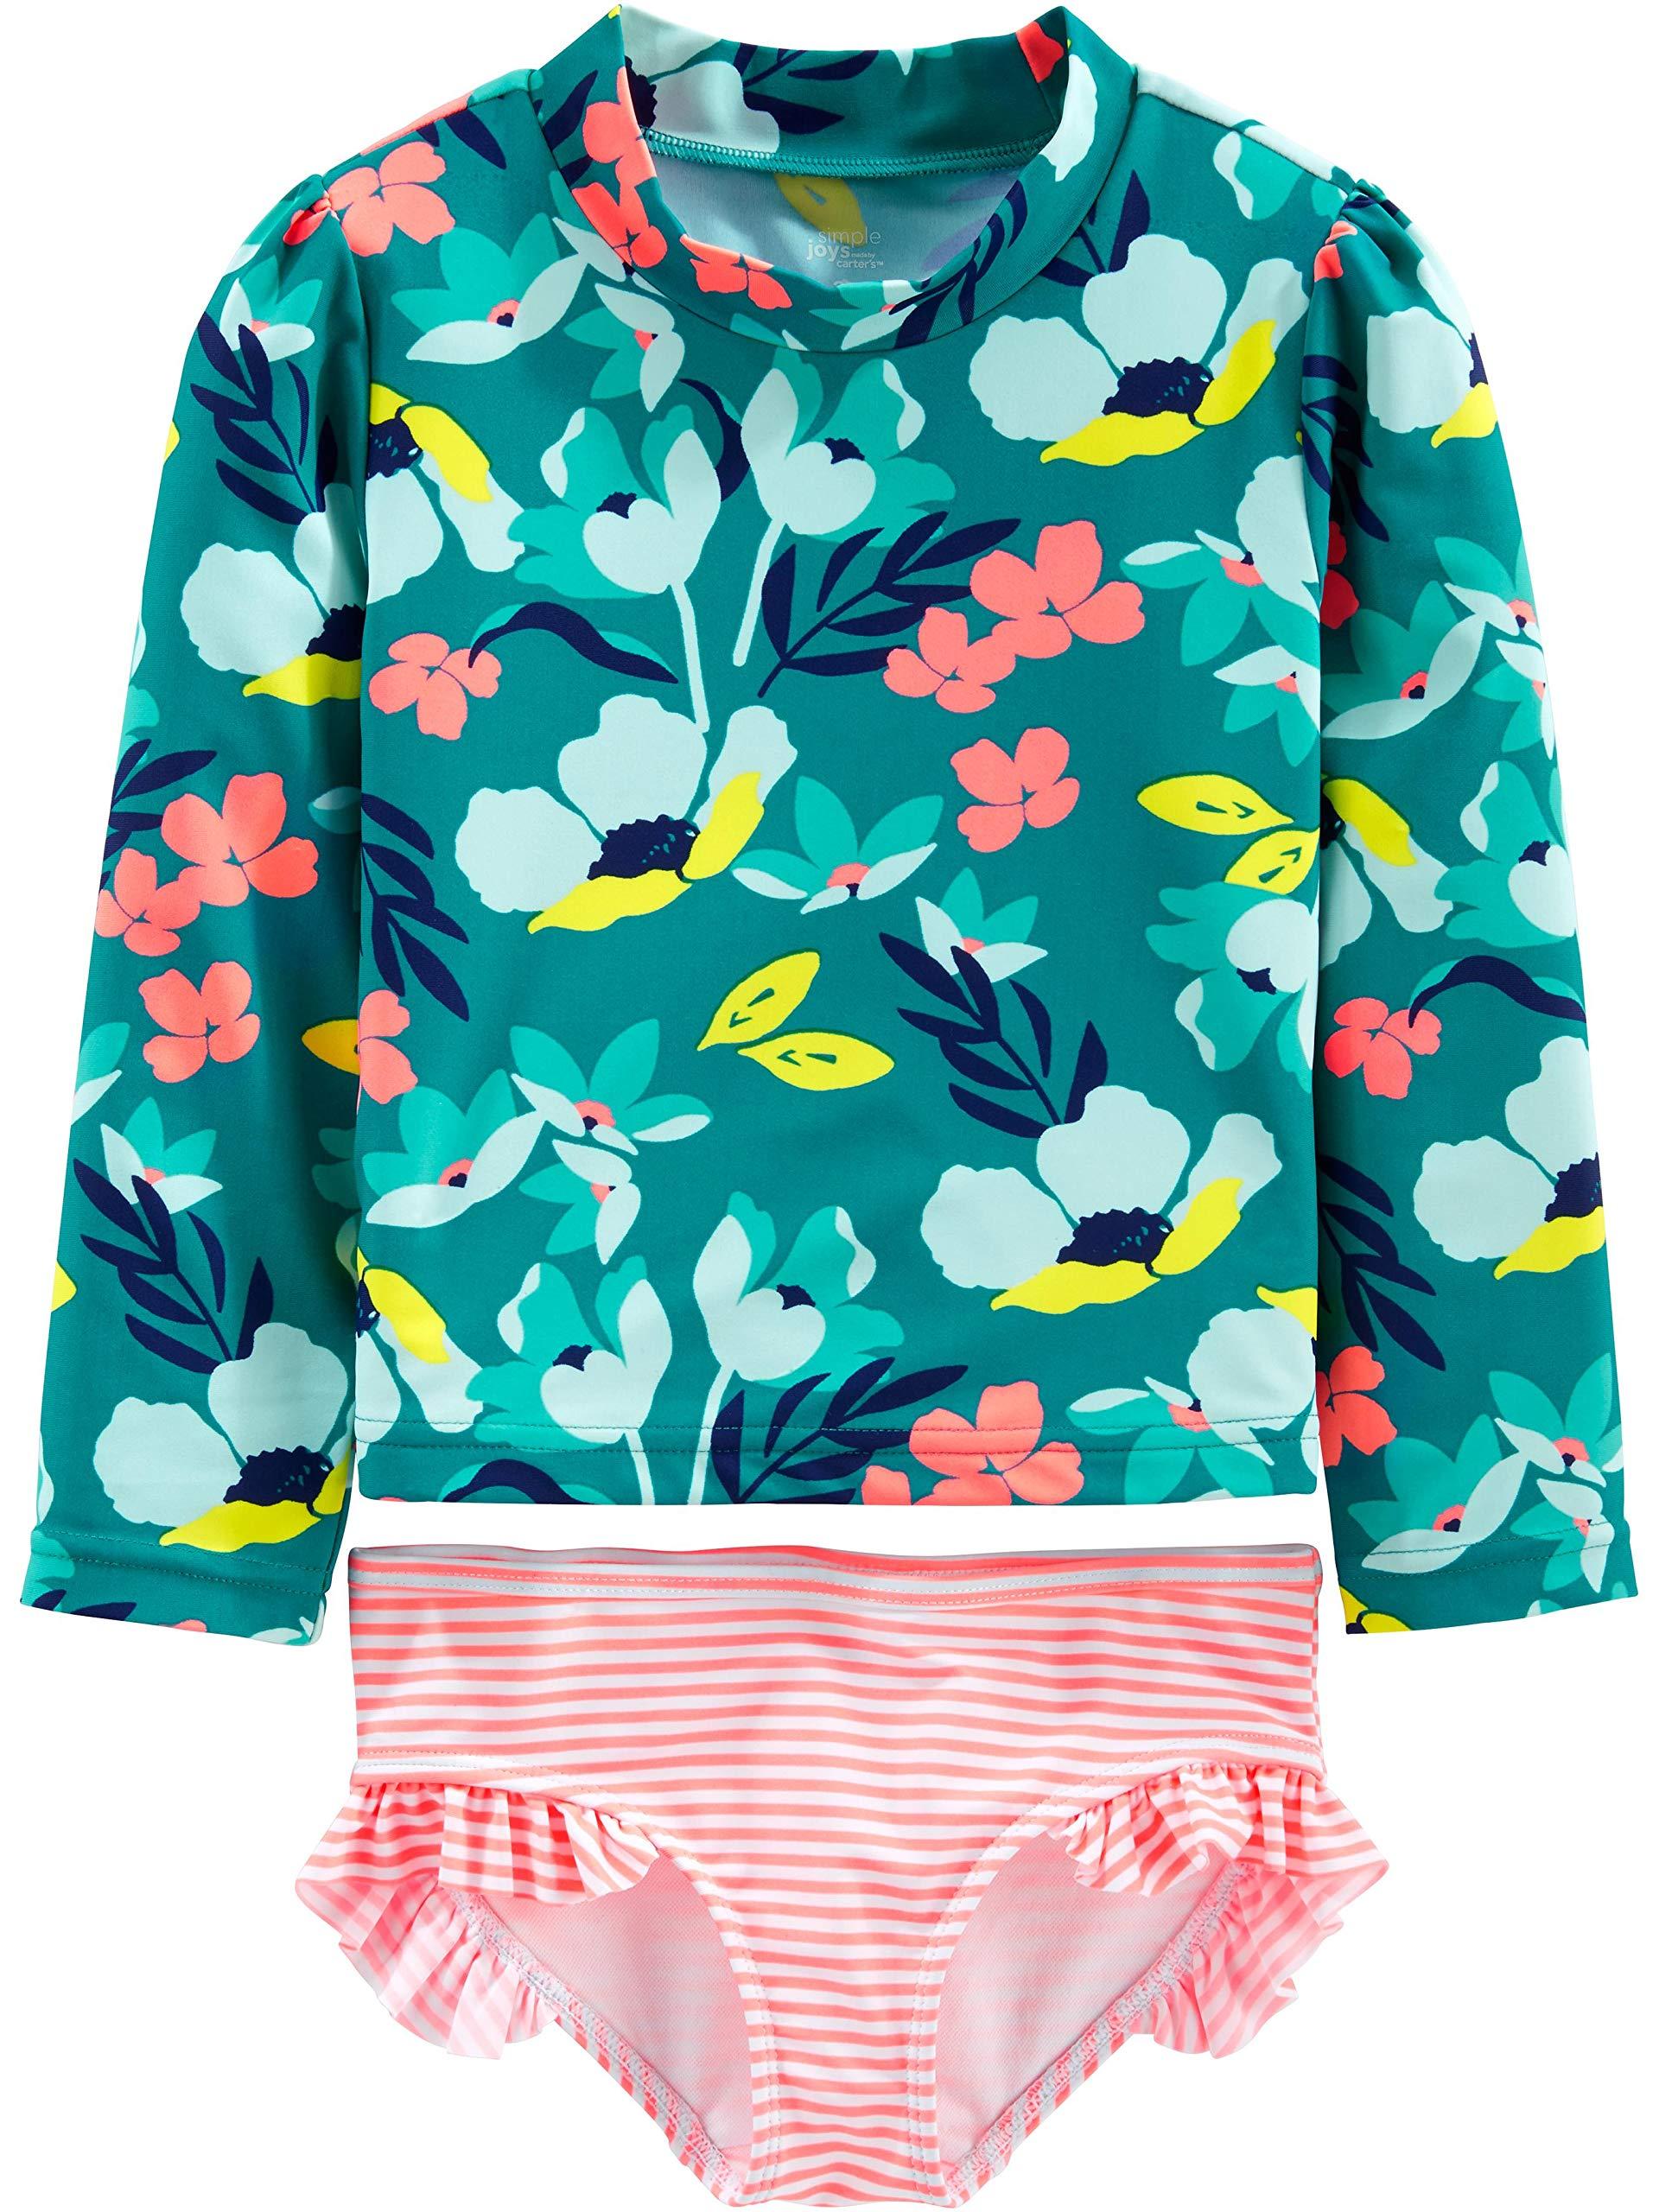 Simple Joys by Carter's Girls' Toddler 2-Piece Rashguard Set, Floral, 3T